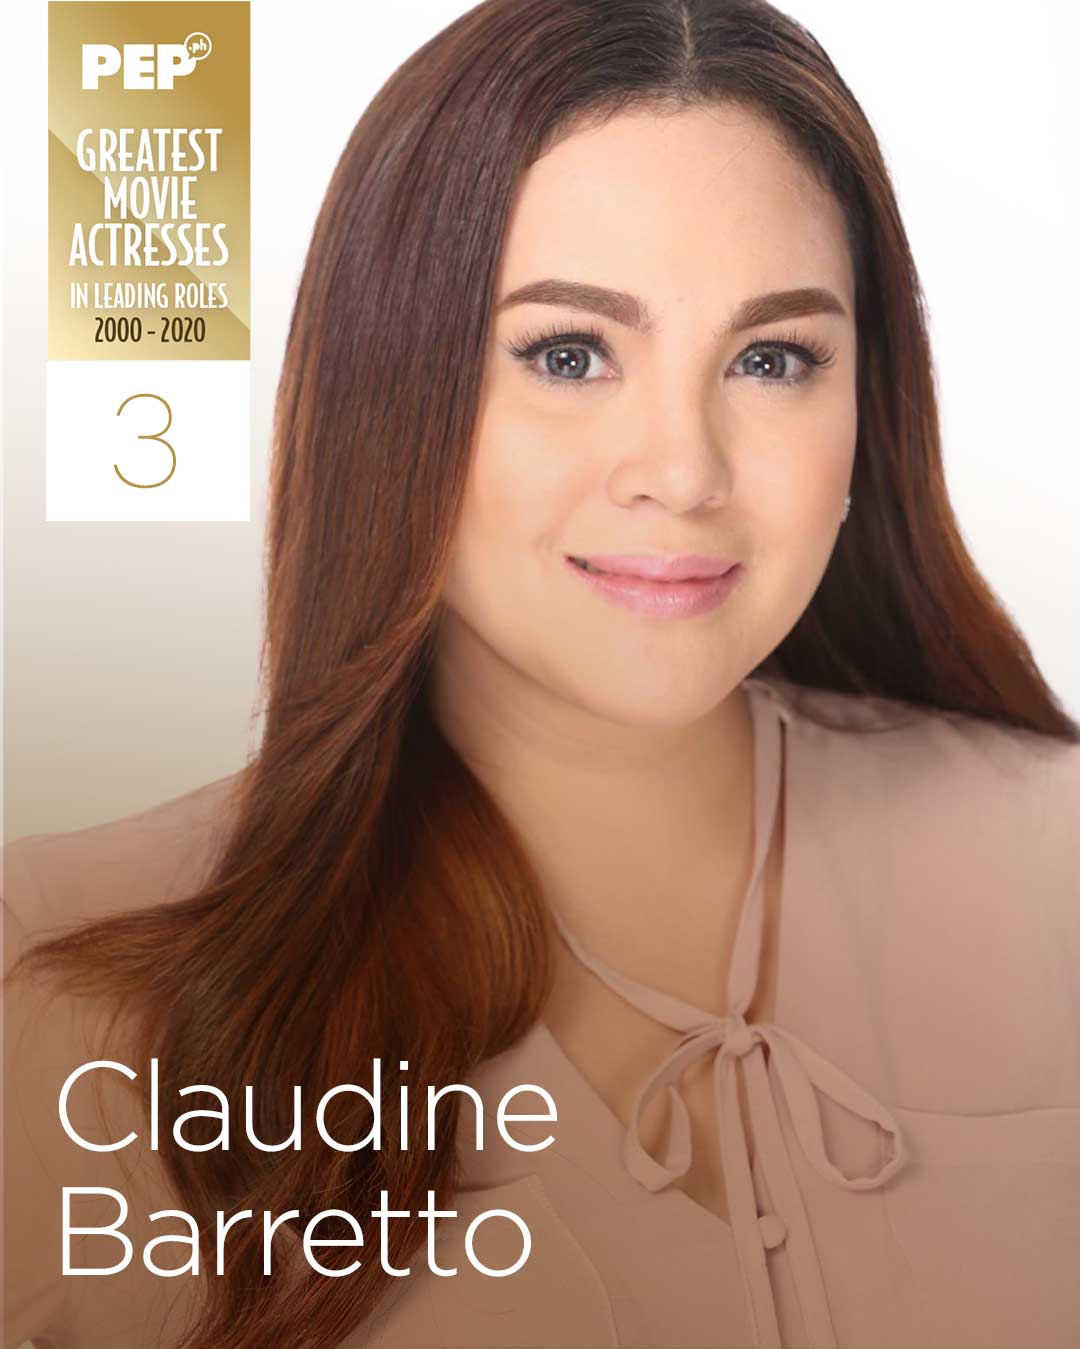 Claudine Barretto, 15 Greatest Actresses